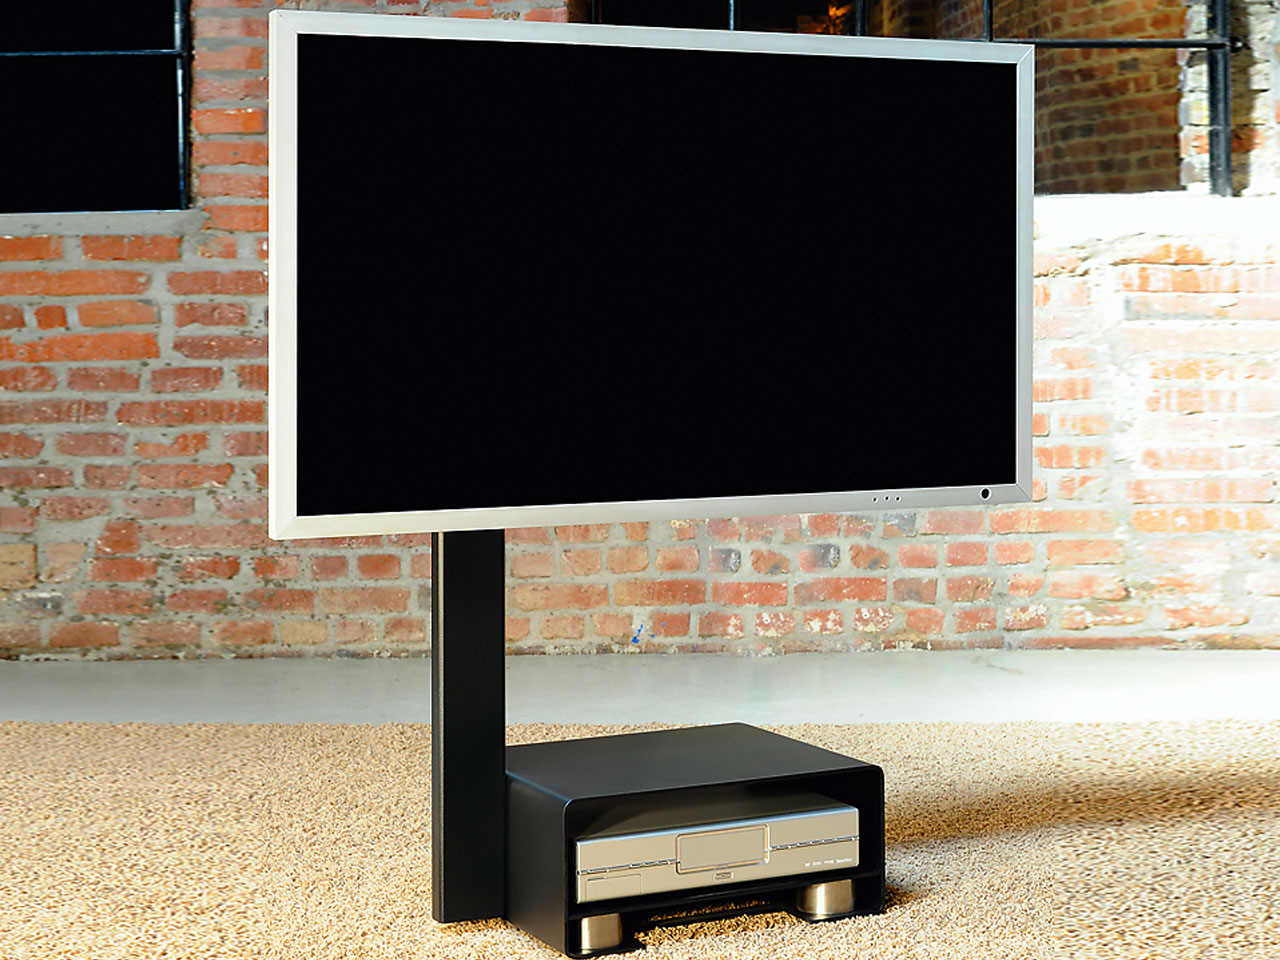 wissmann tv halter mode art125 g nstig kaufen cmb systeme. Black Bedroom Furniture Sets. Home Design Ideas